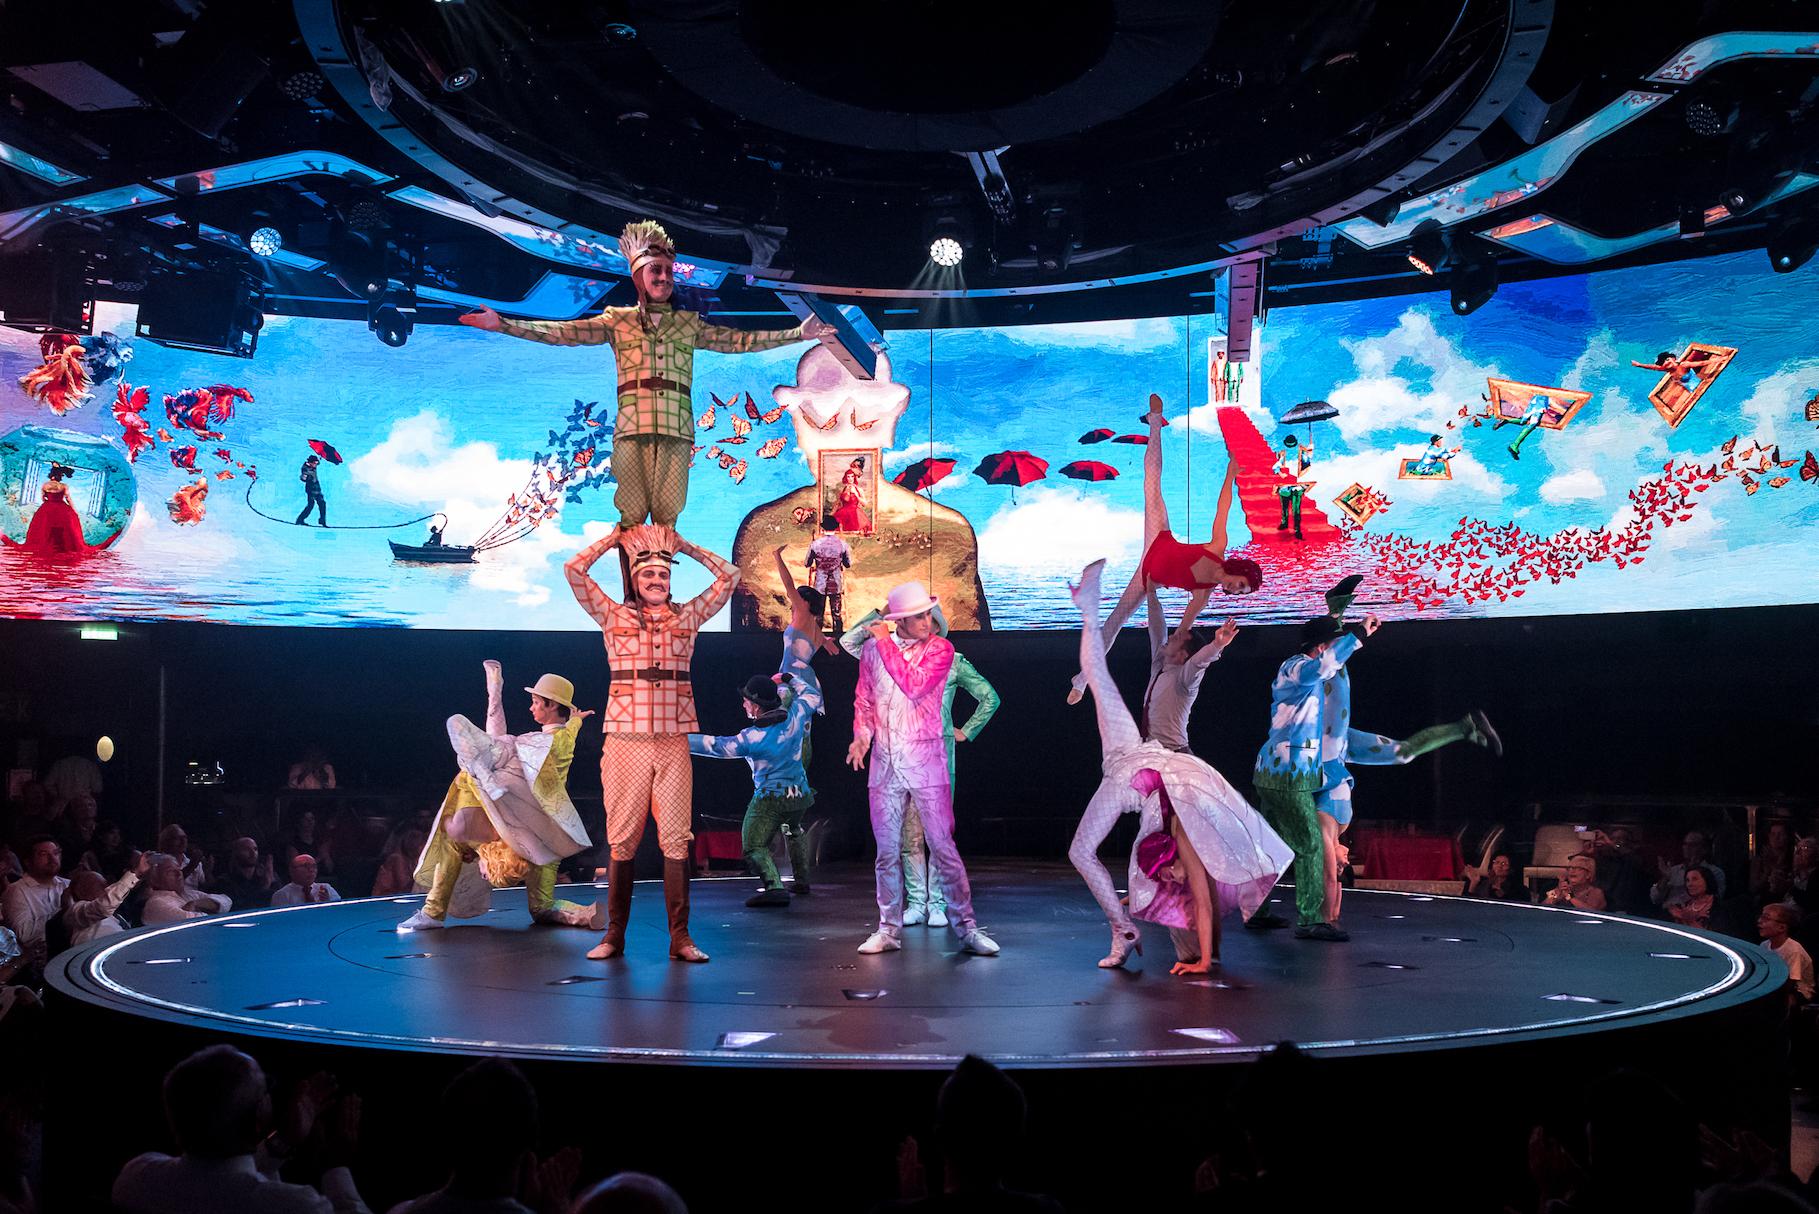 MSC Bellissimo, cirque du soleil at sea, cruise